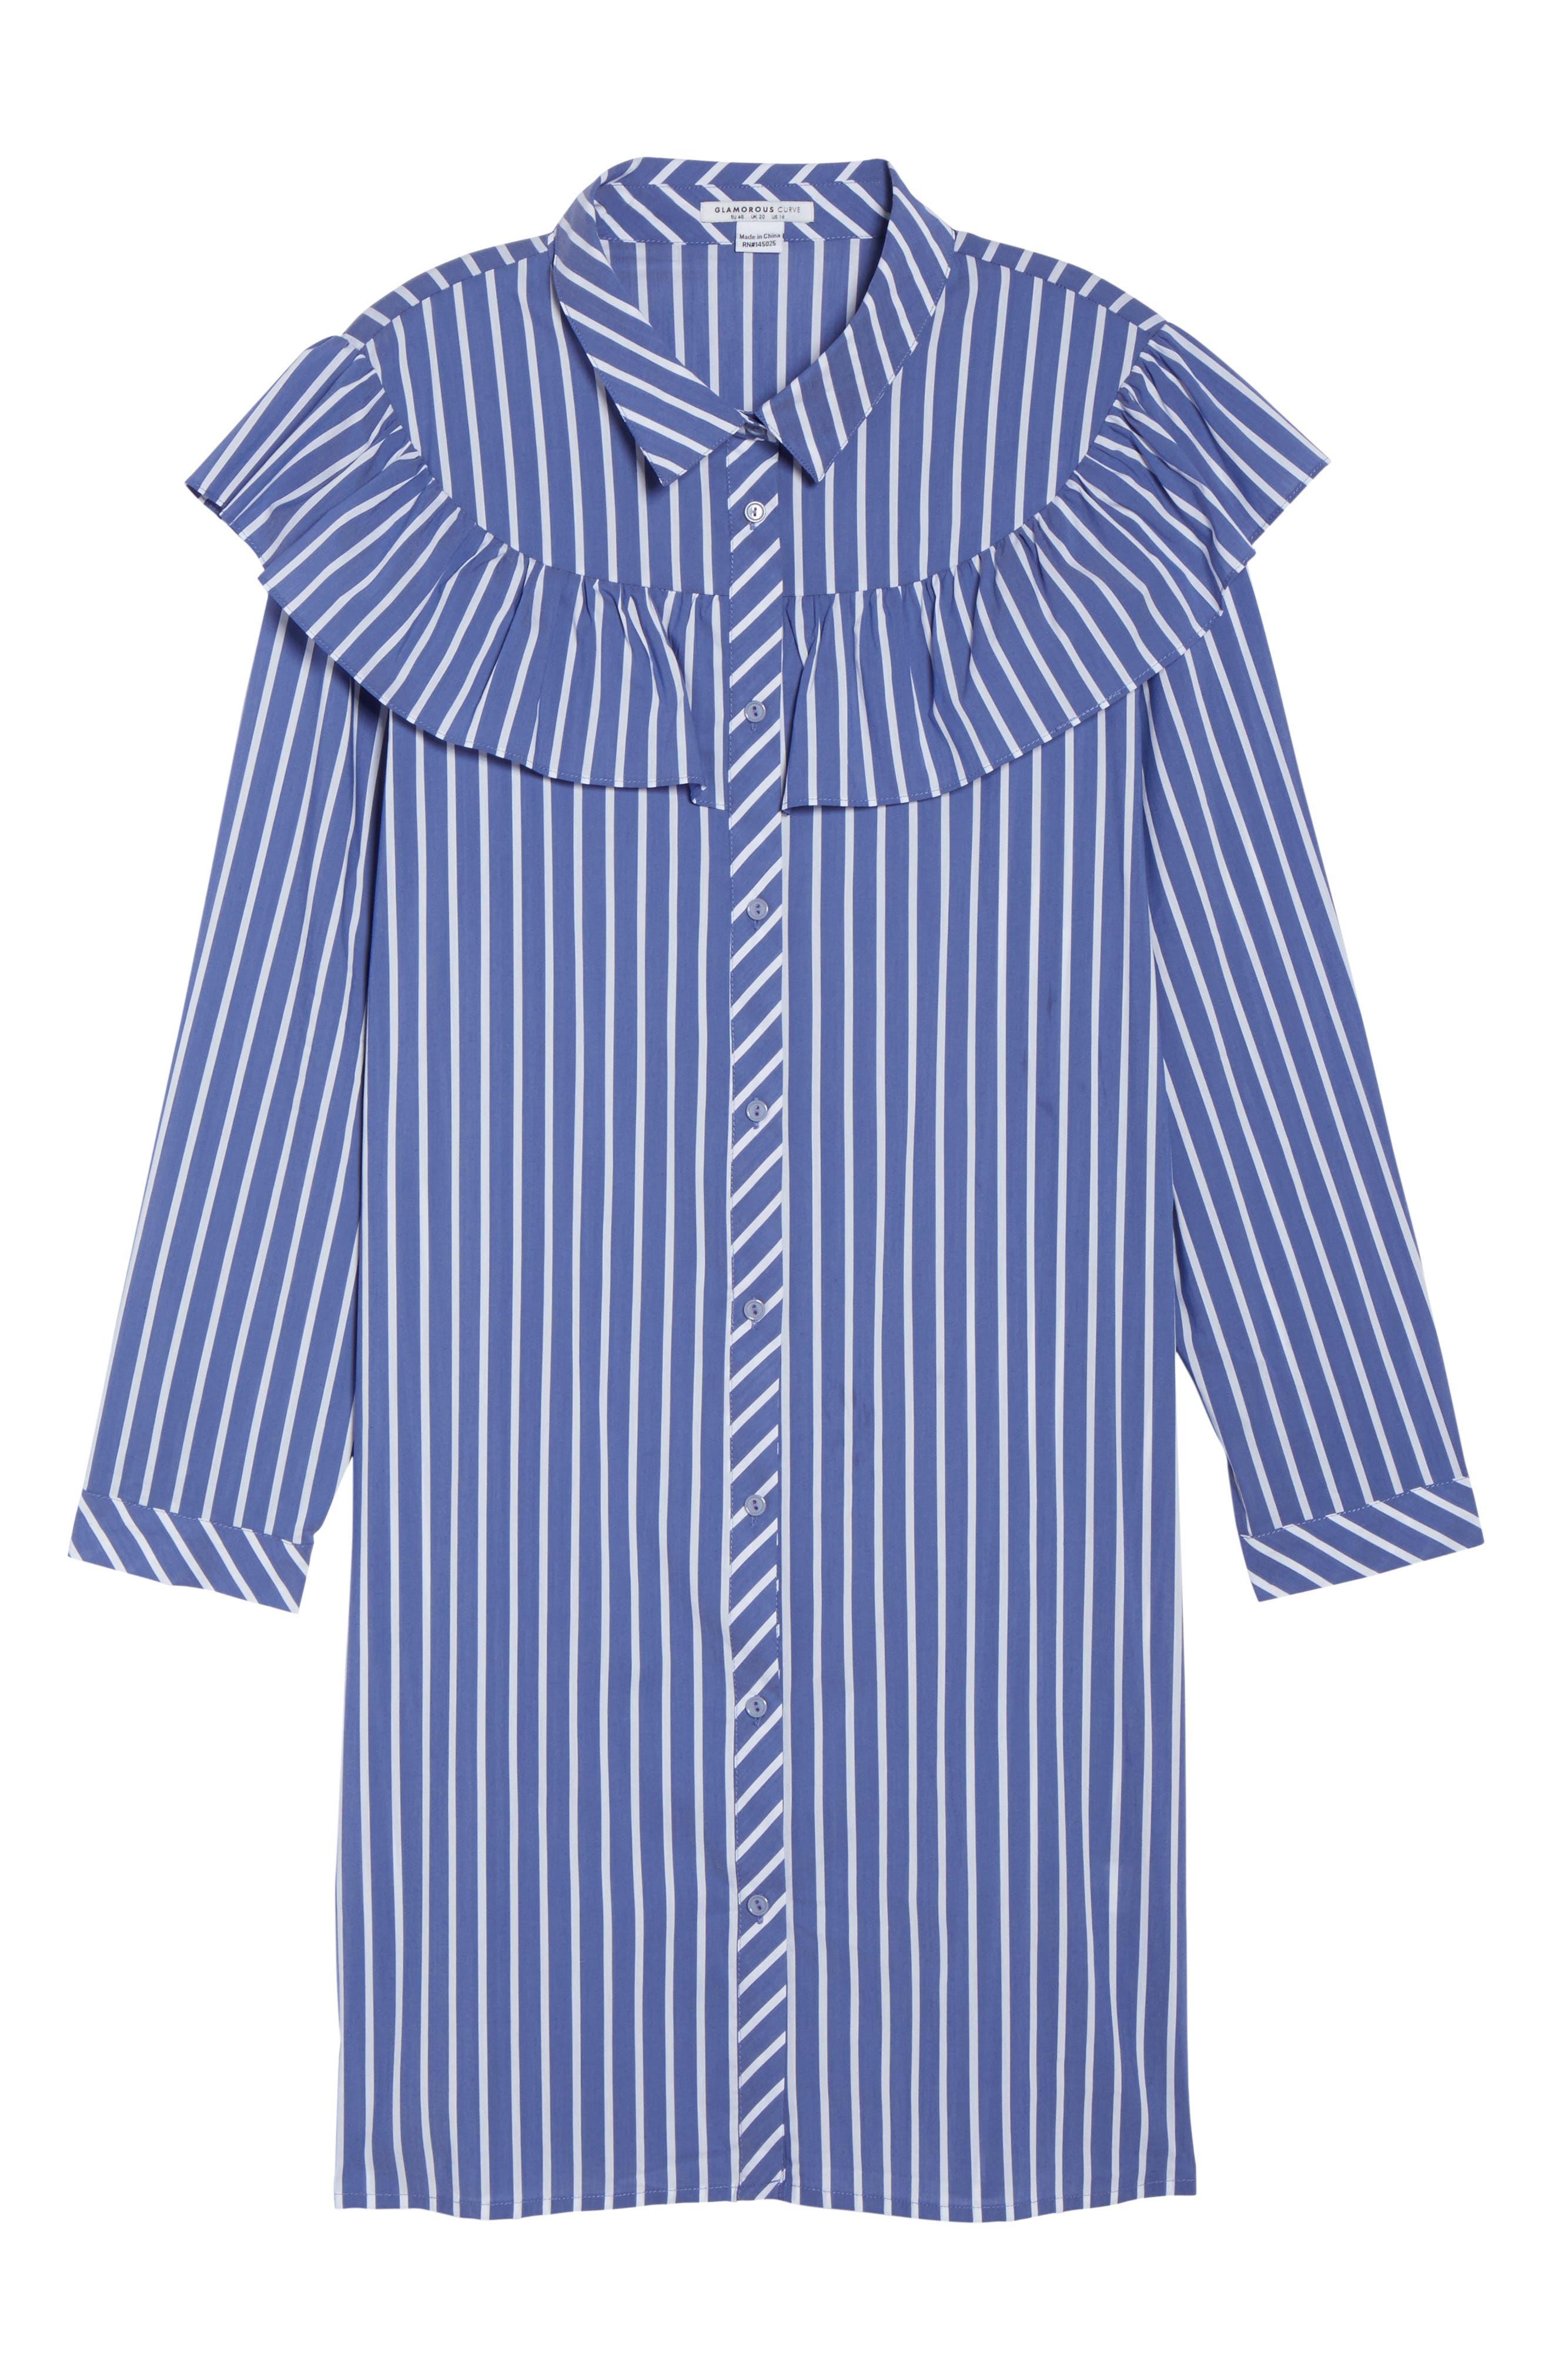 Ruffle Stripe Shirtdress,                             Alternate thumbnail 6, color,                             Blue White Stripe